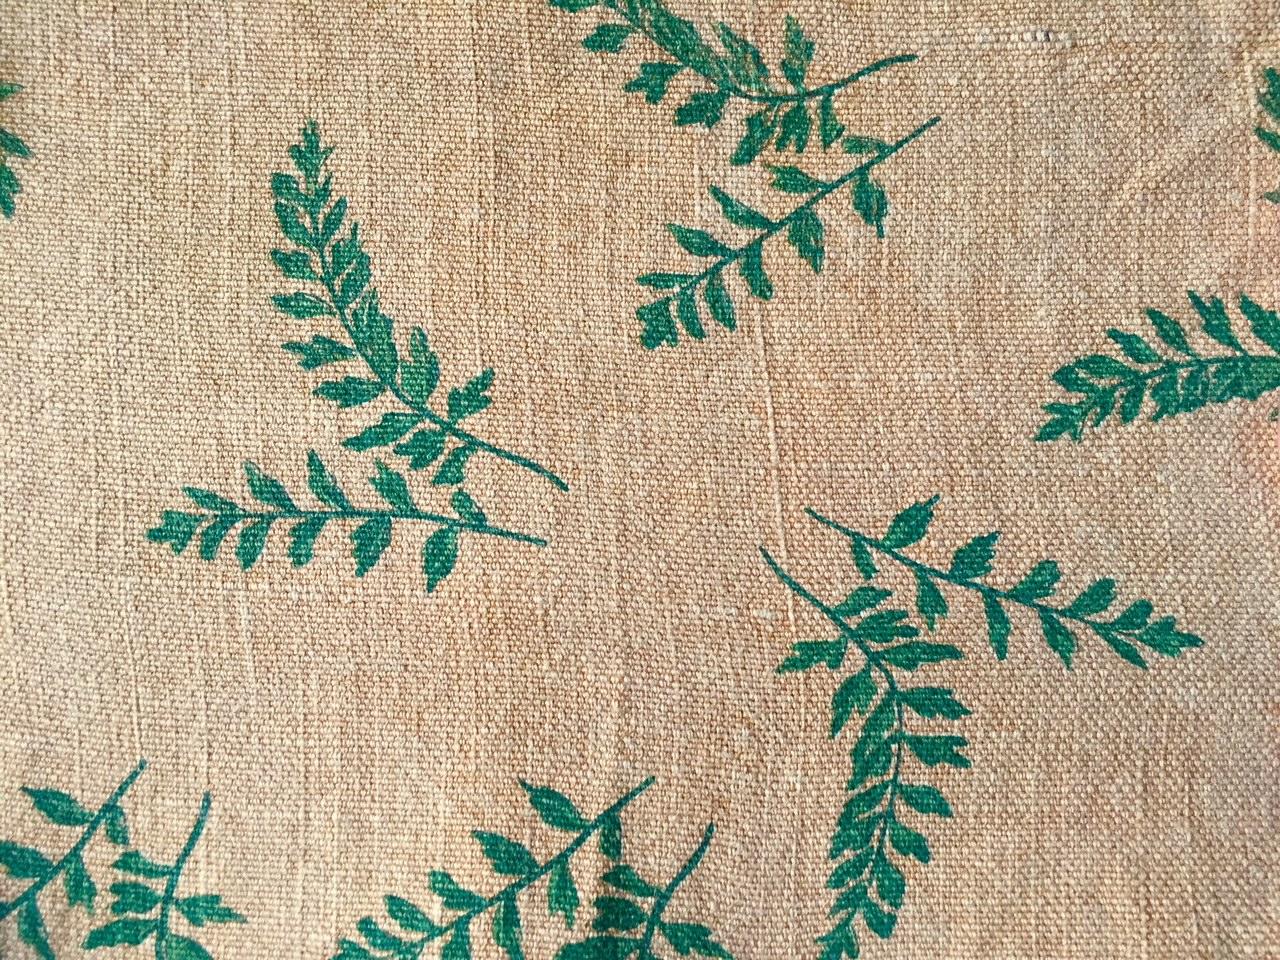 Tulsi Print on Camel Tone P005 - Earthy. Fallen leaves giving way to fresh saplings. Quintessential Burlap People. Free falling. Healing.